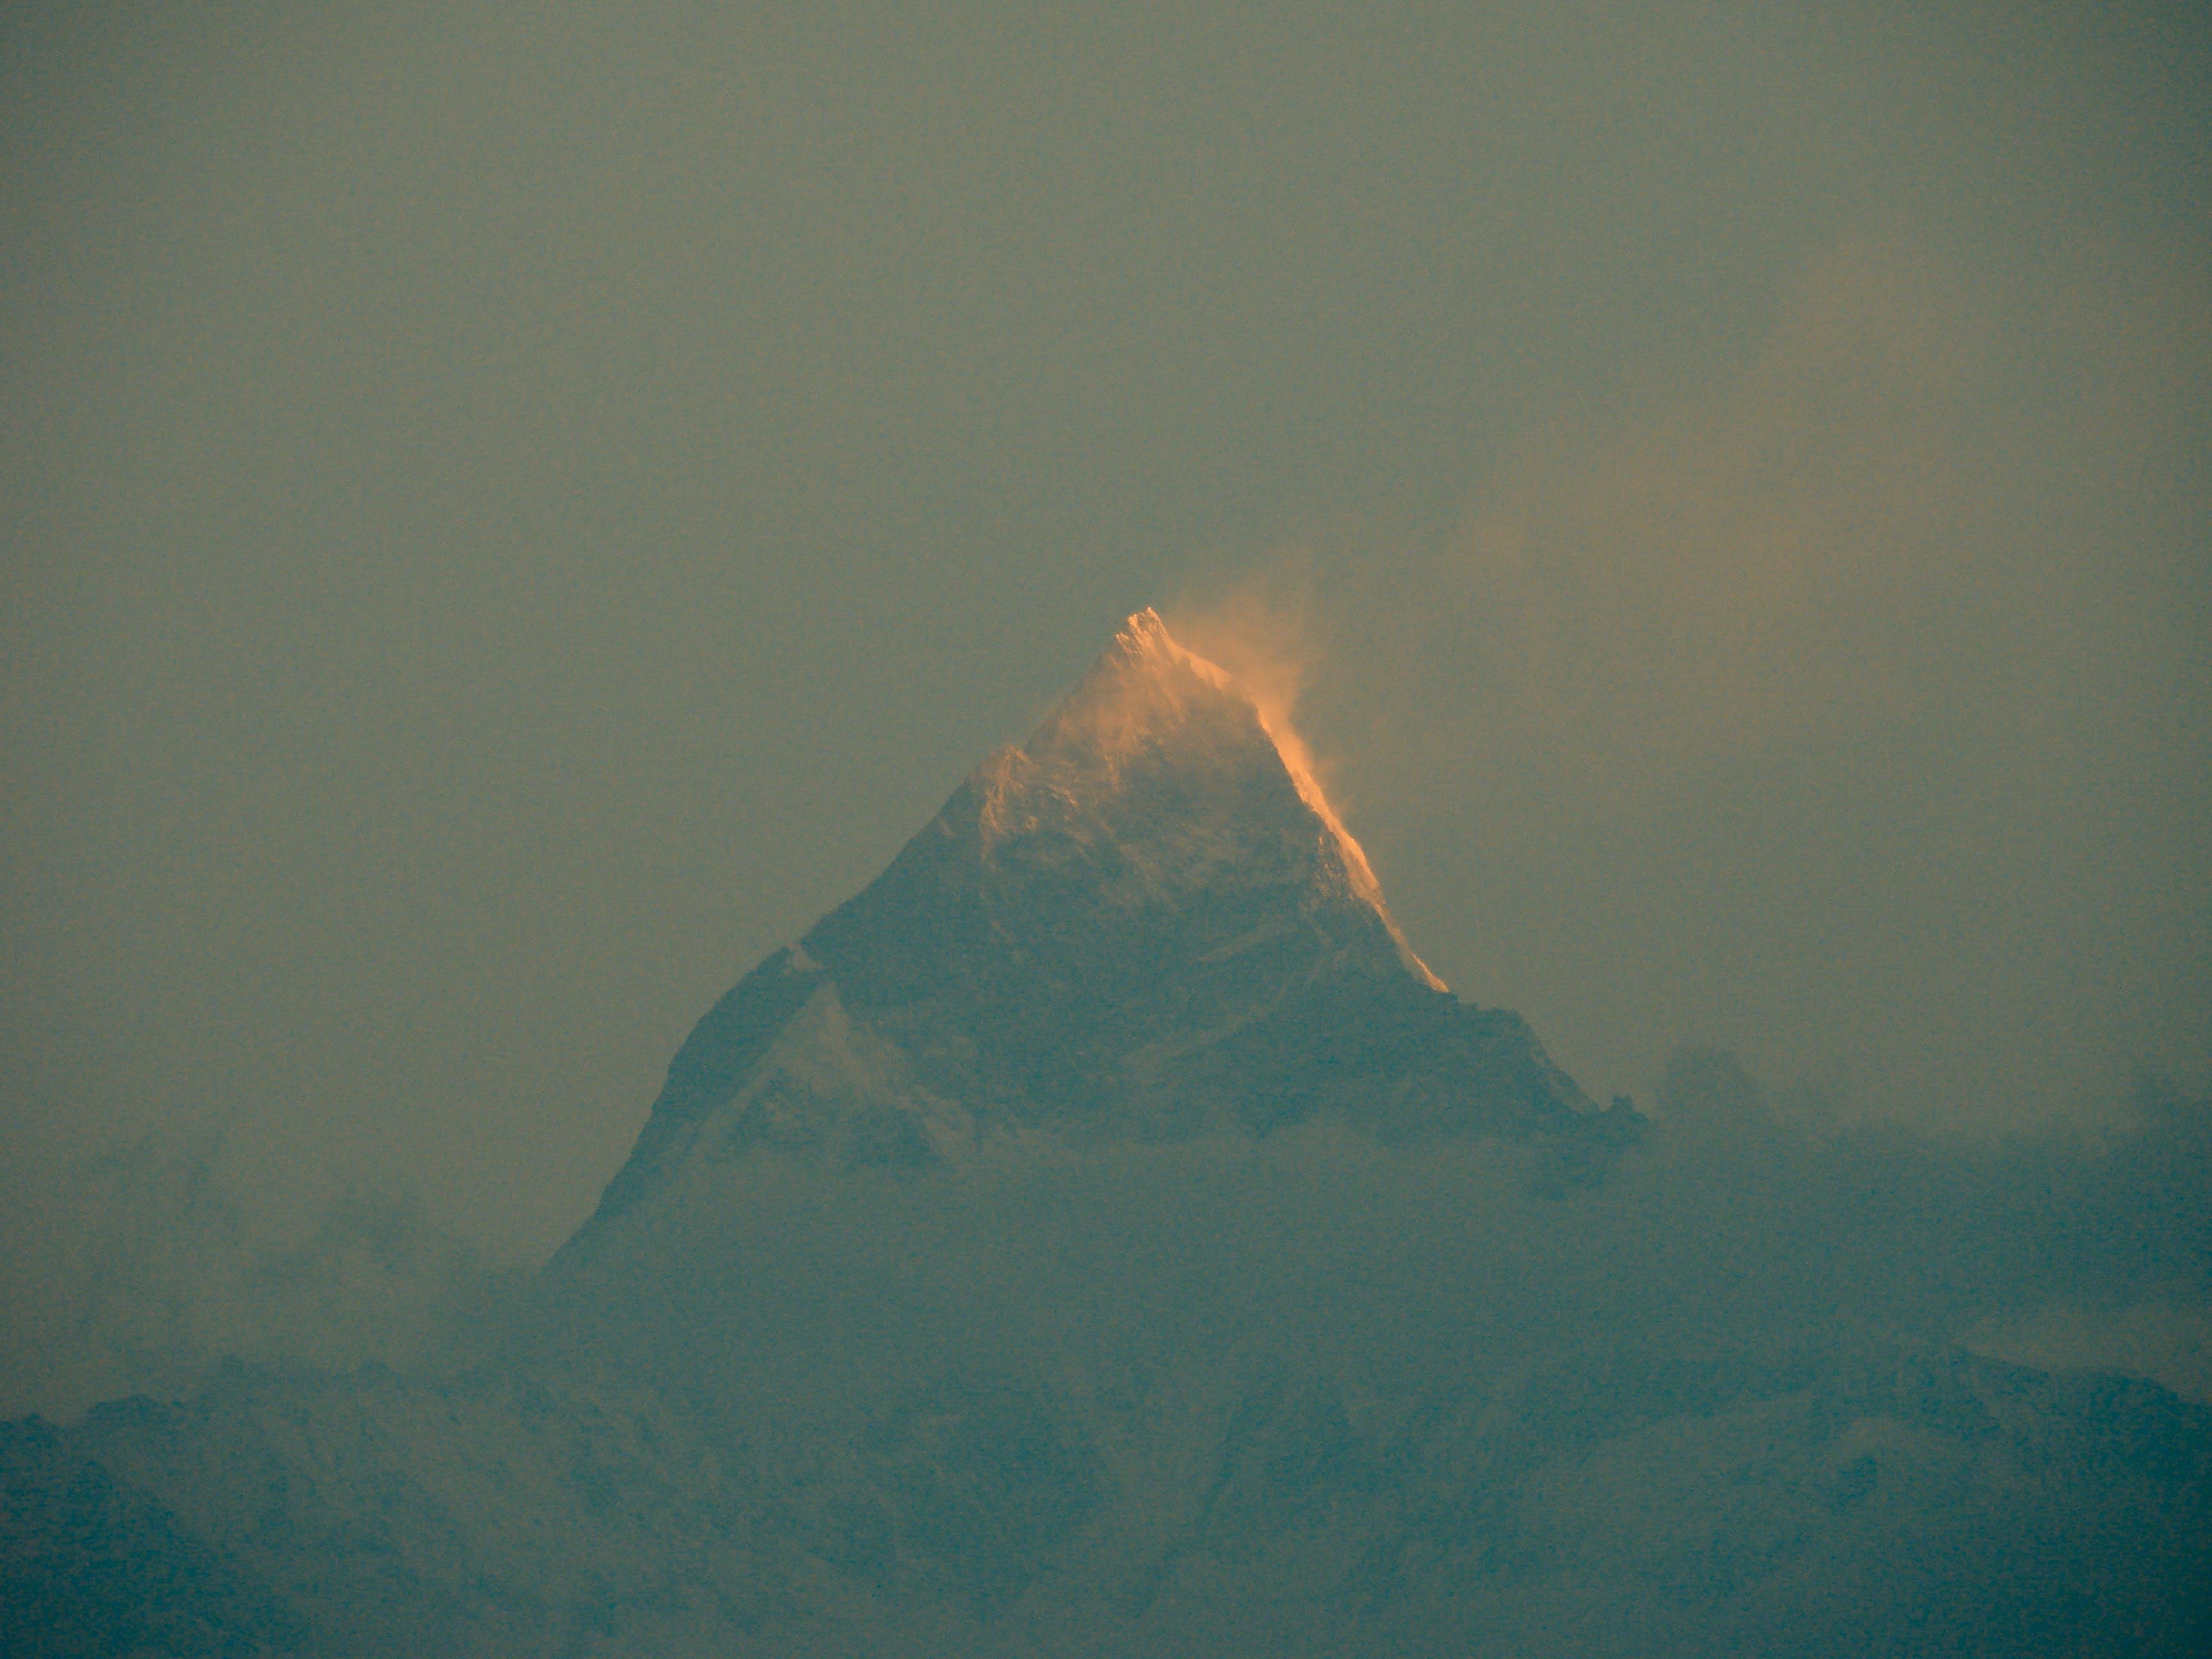 Free stock photo of mountains, nature, reflection, nepal